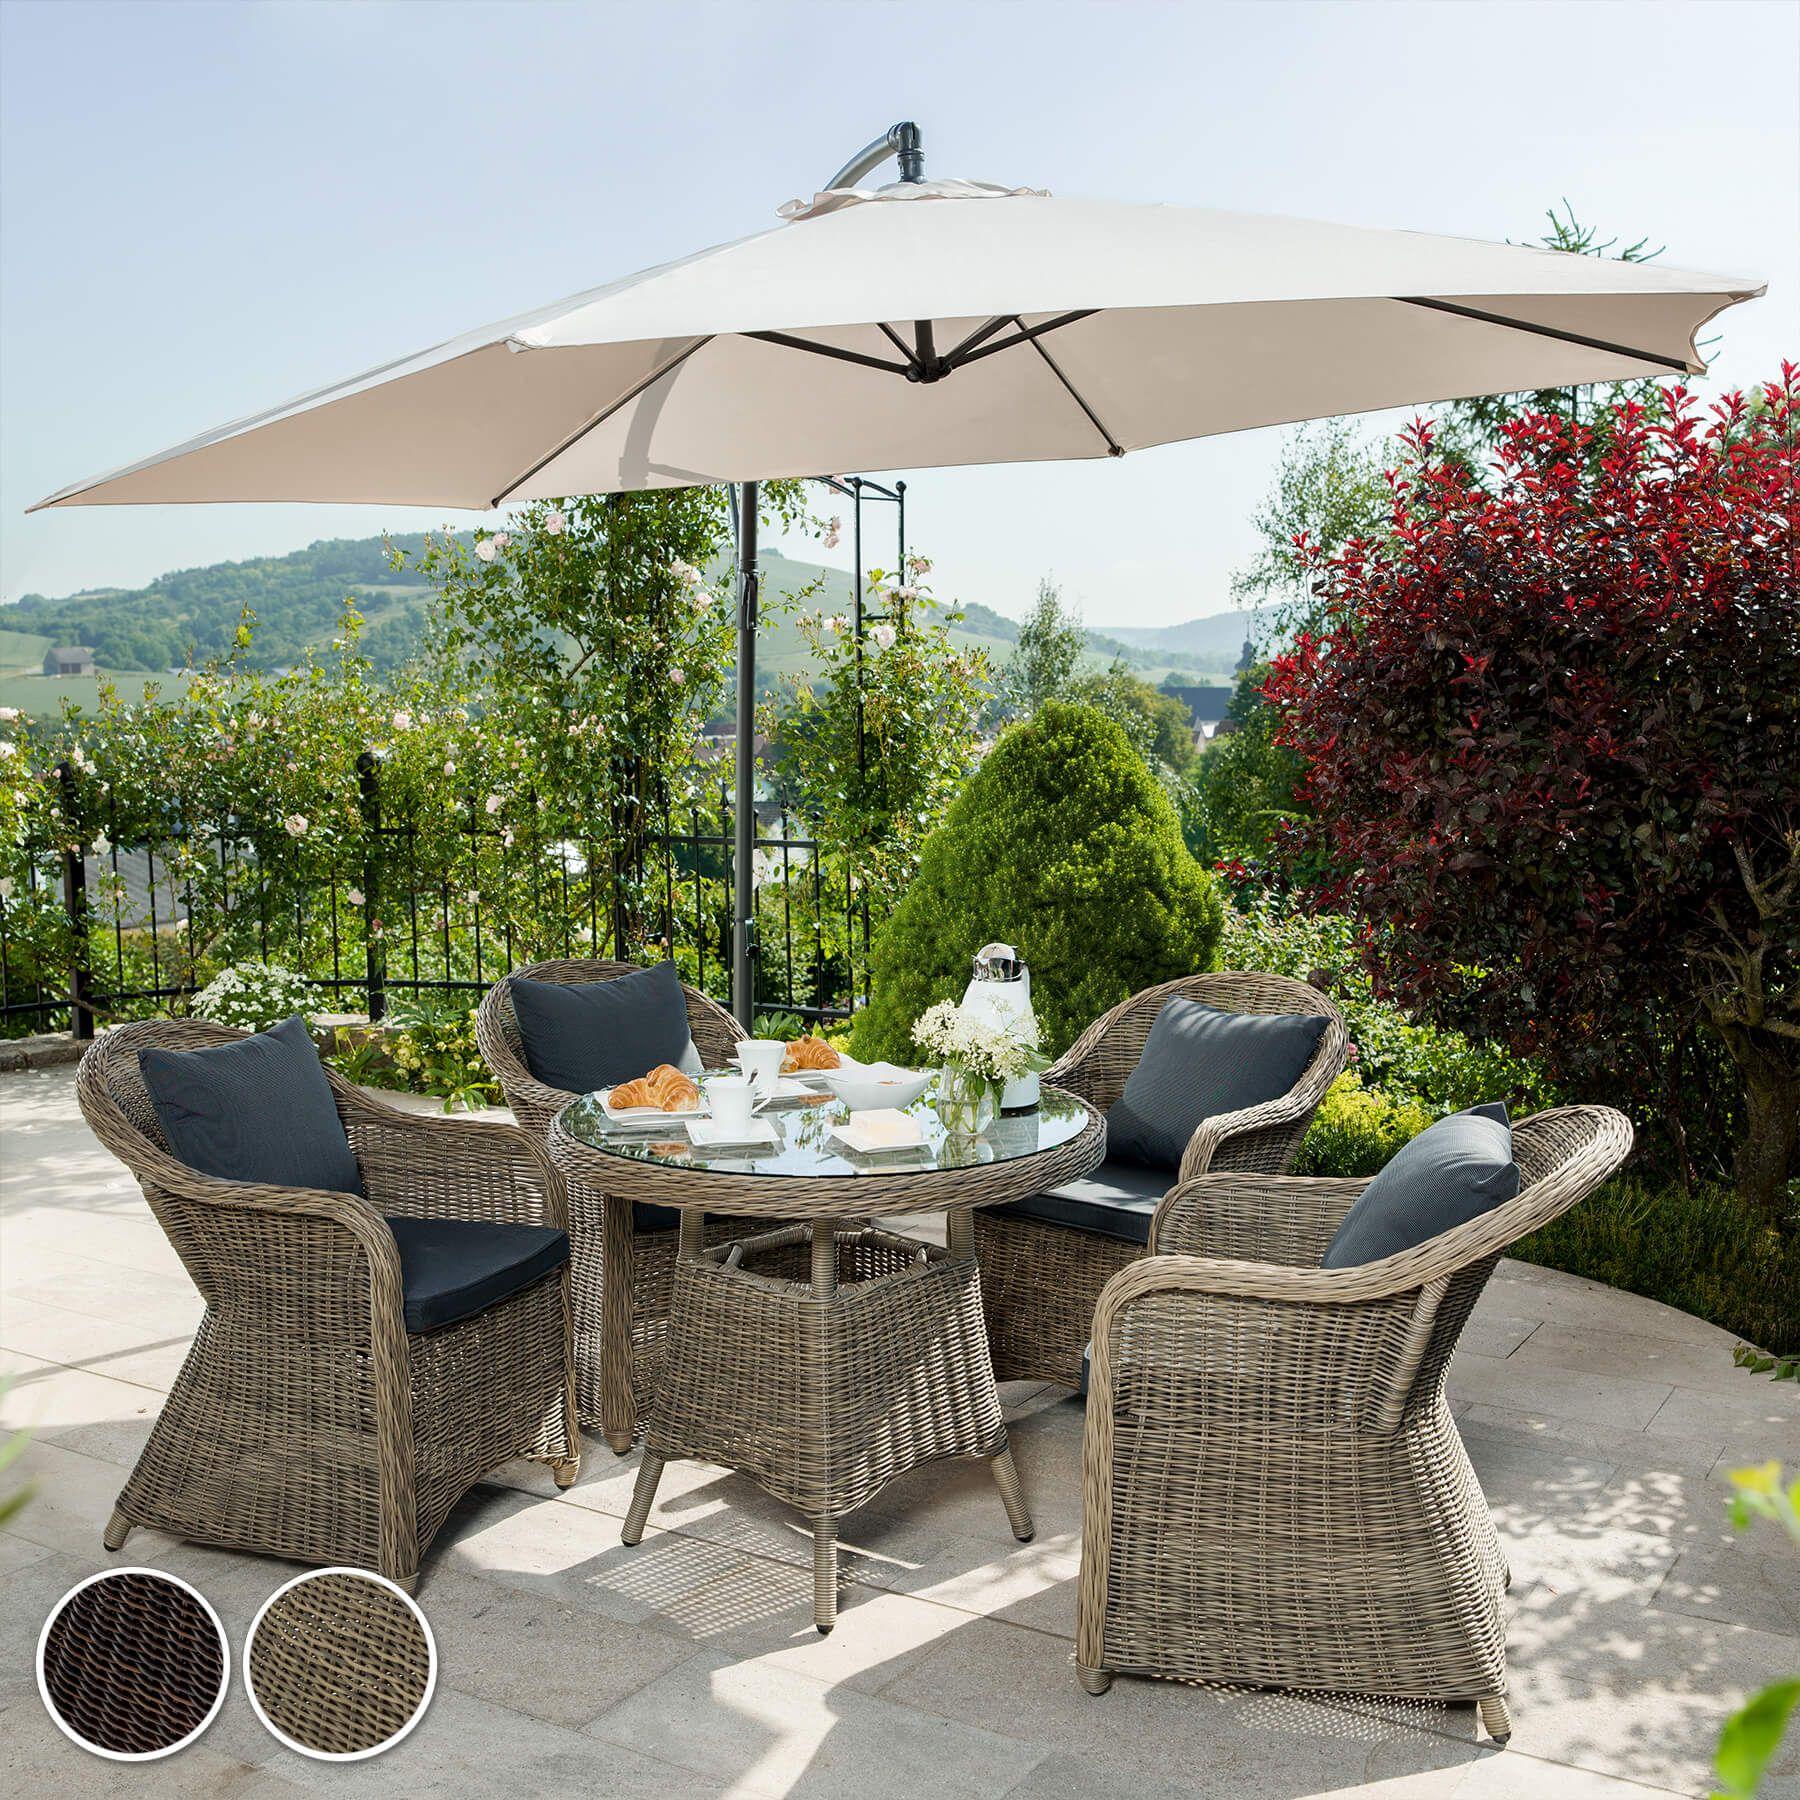 Details Sur Aluminium Salon De Jardin 4x Chaise 1x Table Resine Tressee Osier Poly Rotin Bru